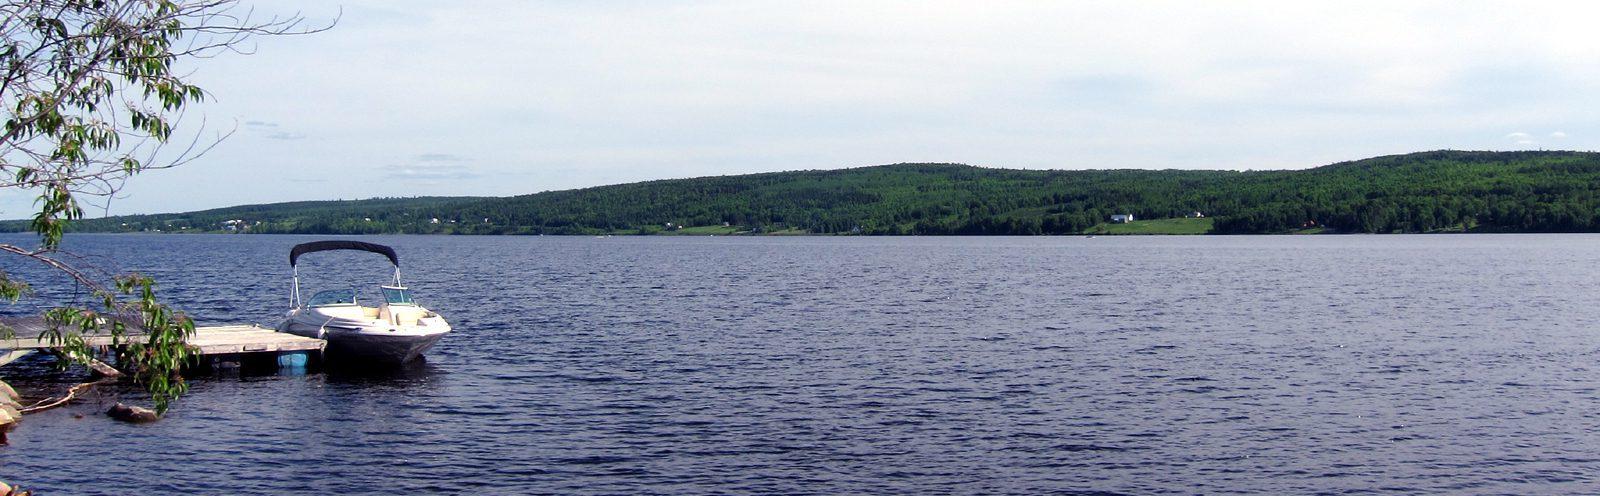 New Brunswick - Saint John River sliver